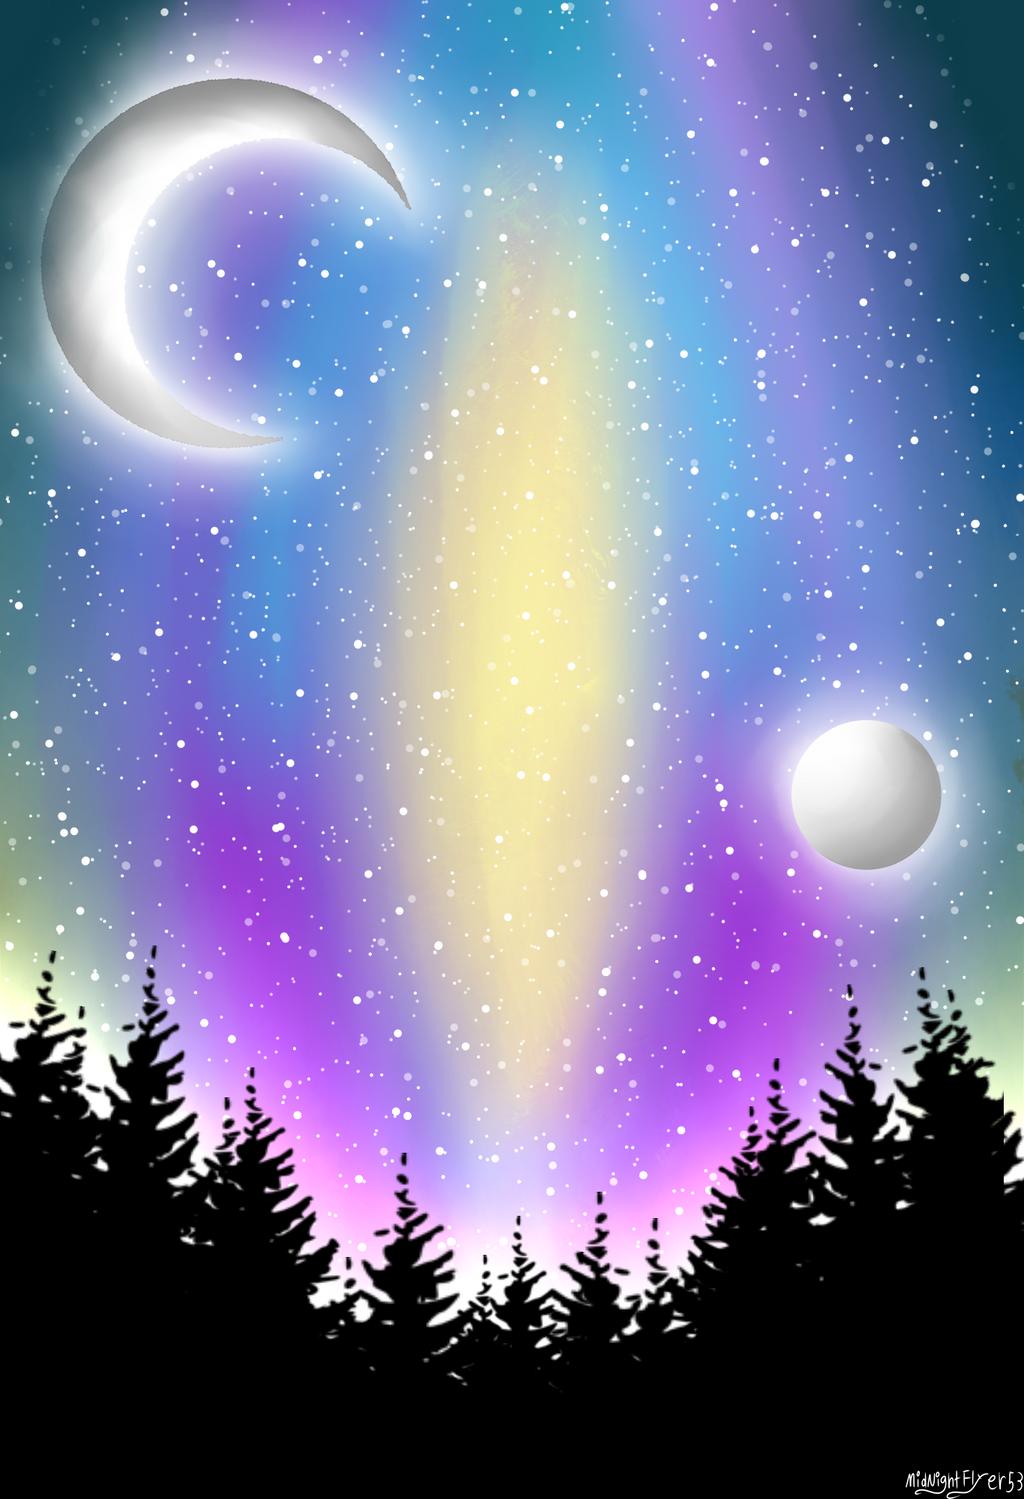 Galaxy Background by MidNightFlyer53